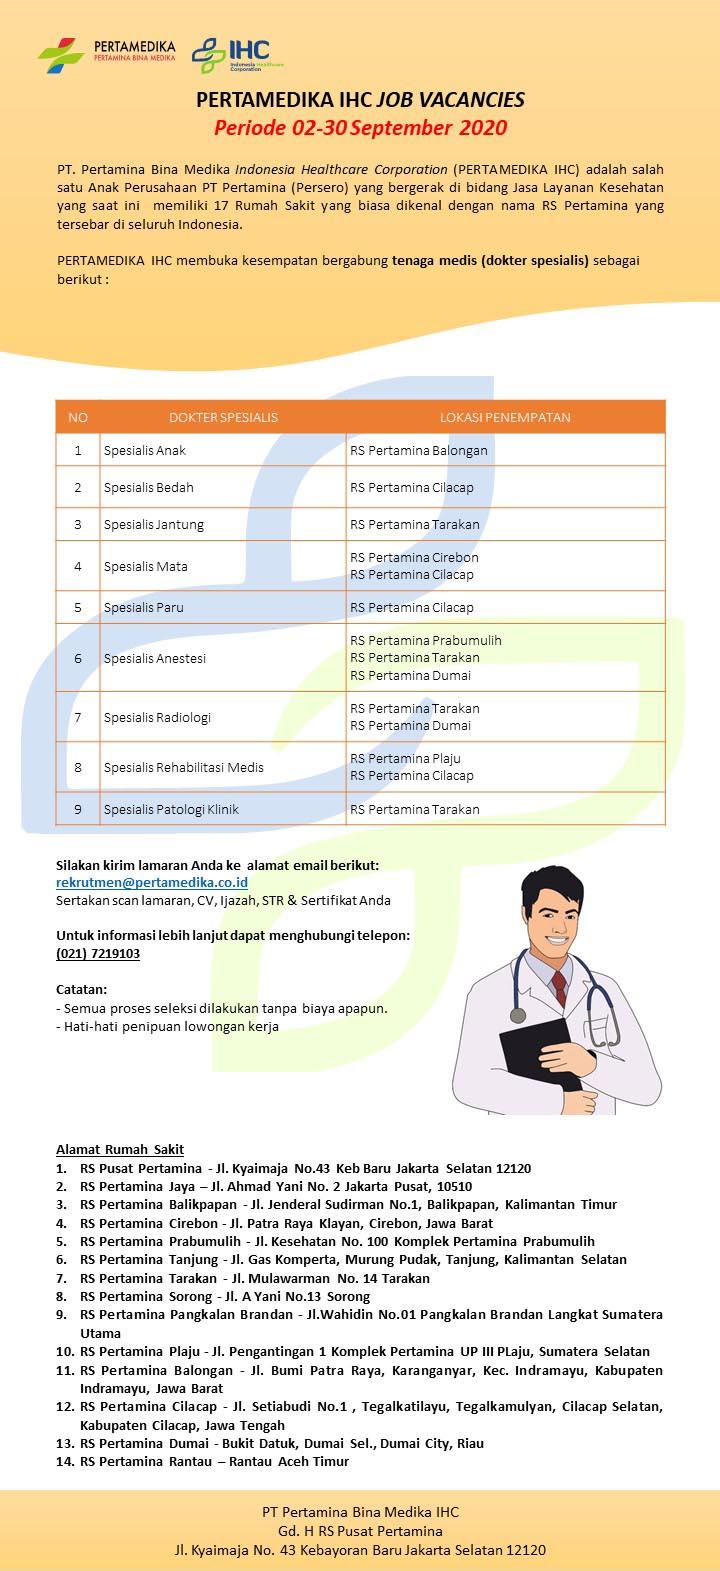 Lowongan Kerja Rumah Sakit Pertamina [Pertamedika] September 2020